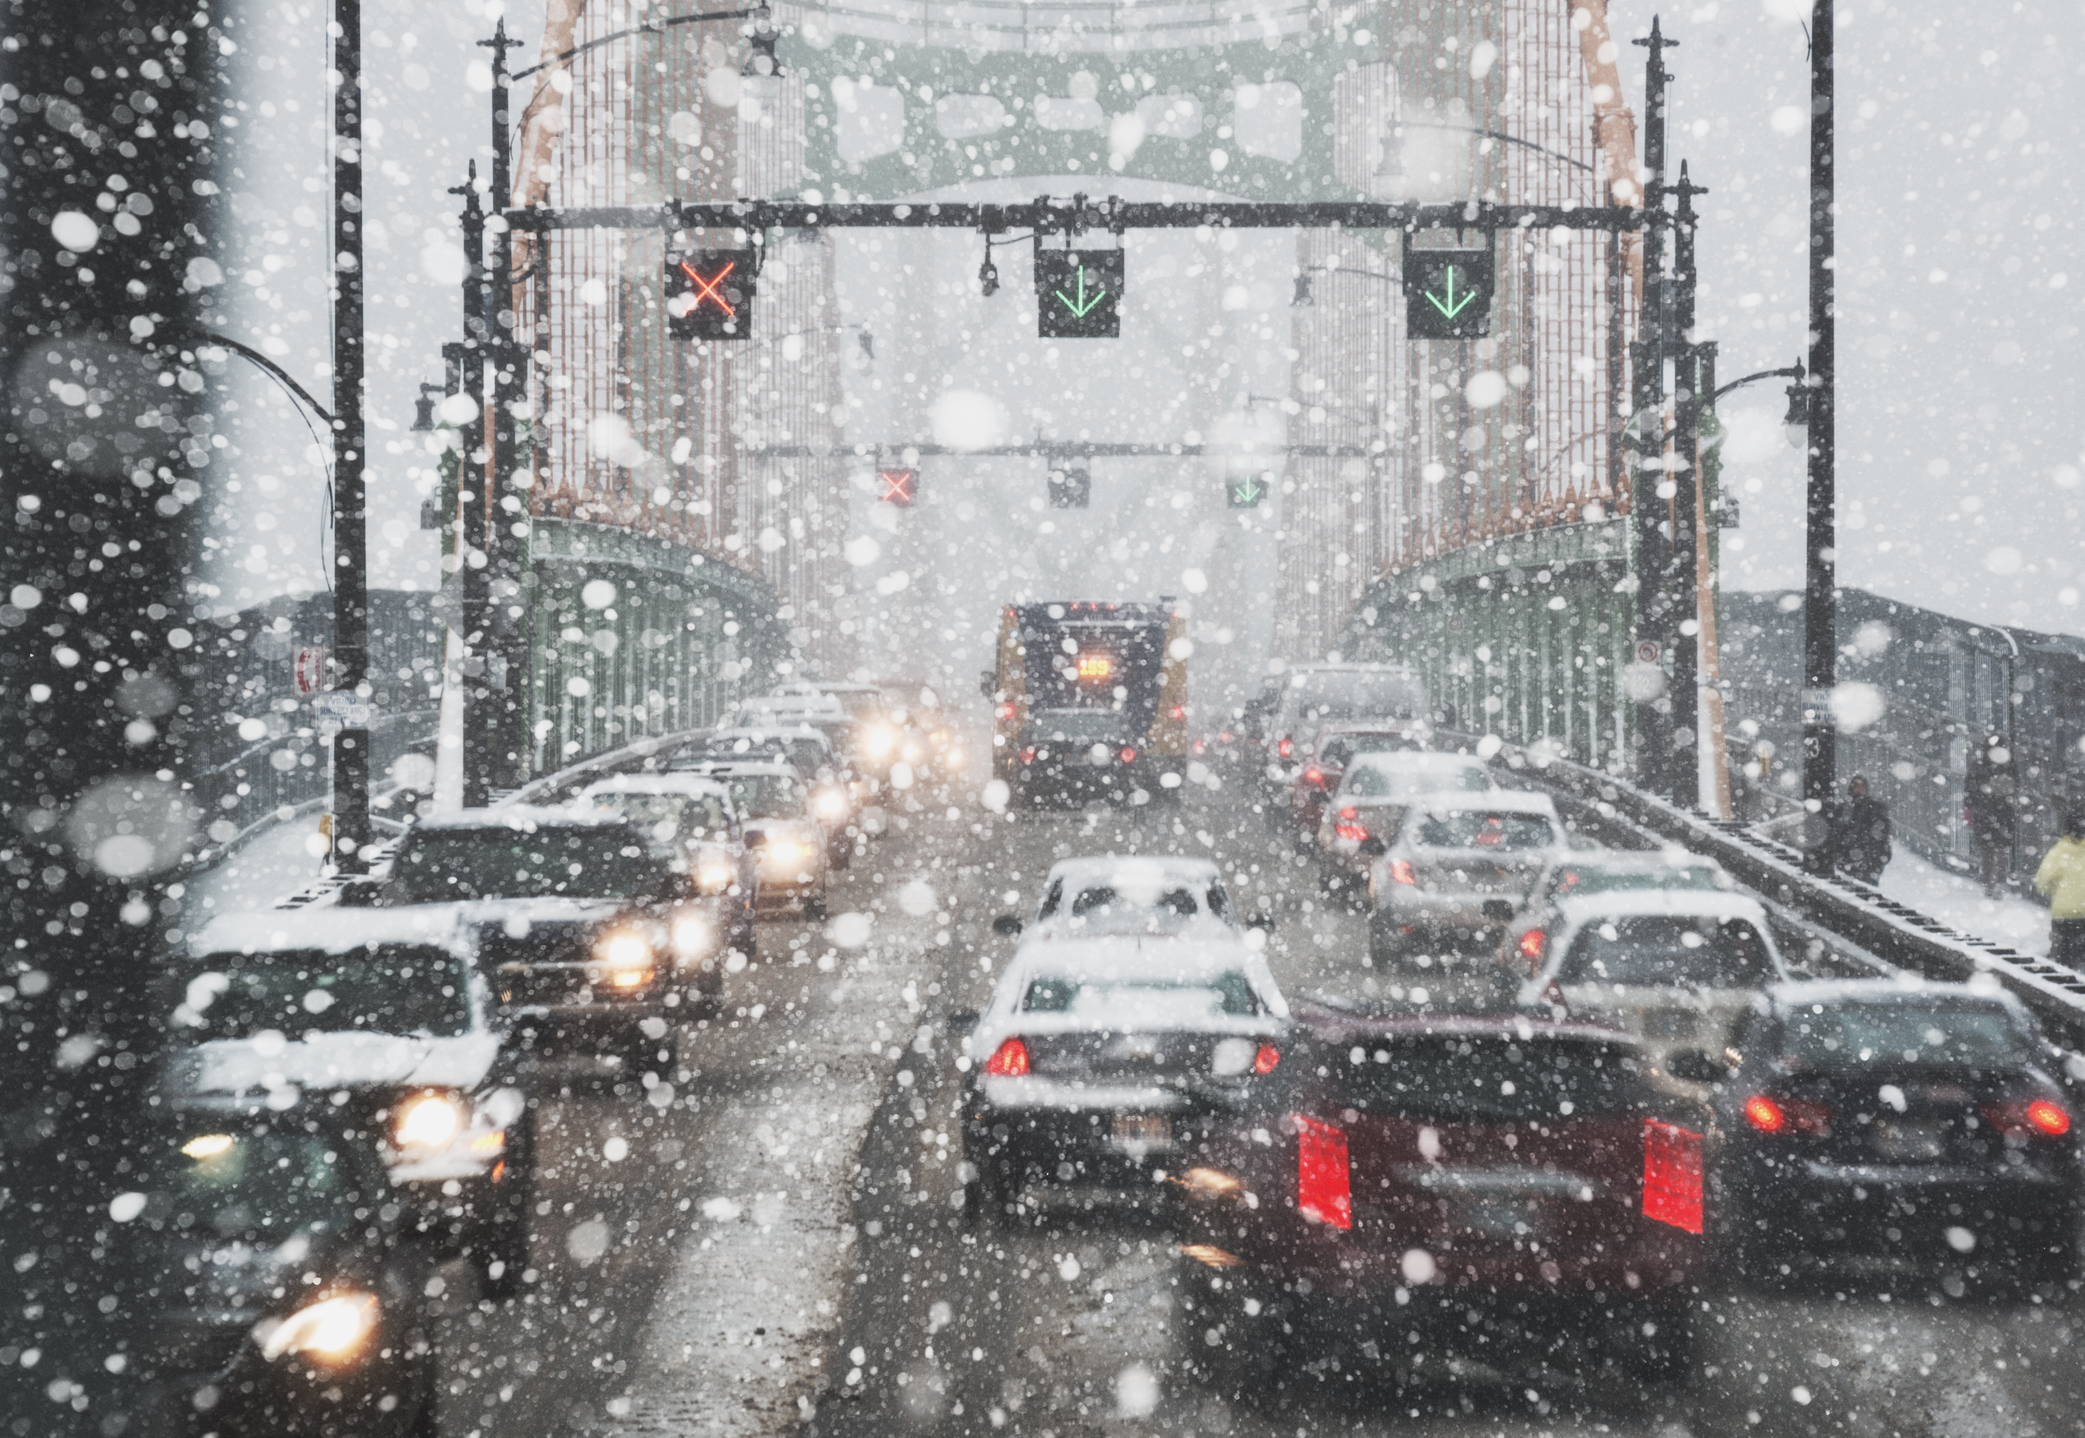 Rush hour traffic during a heavy snowfall on the Angus L. MacDonald Bridge.